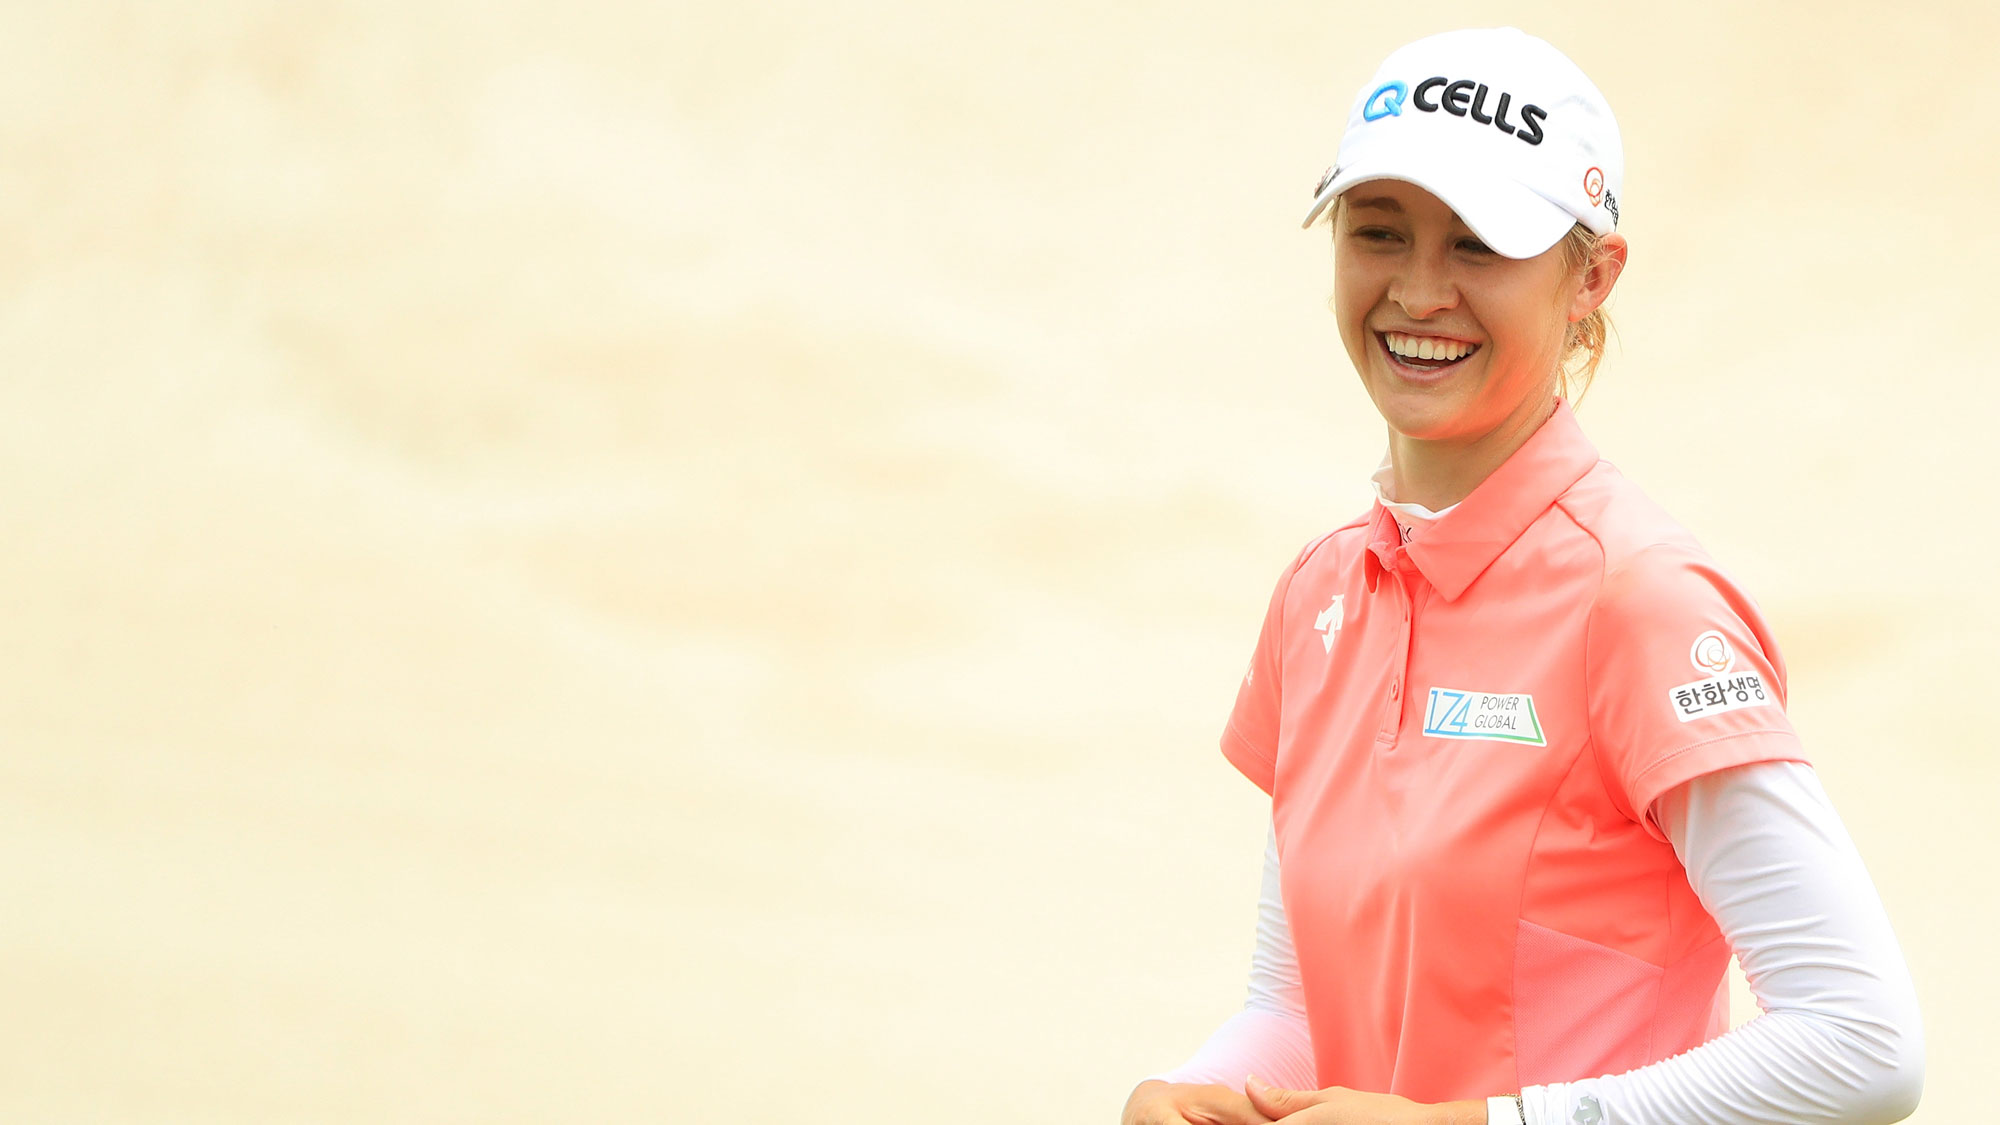 US teen golf star tops leaderboard in Singapore